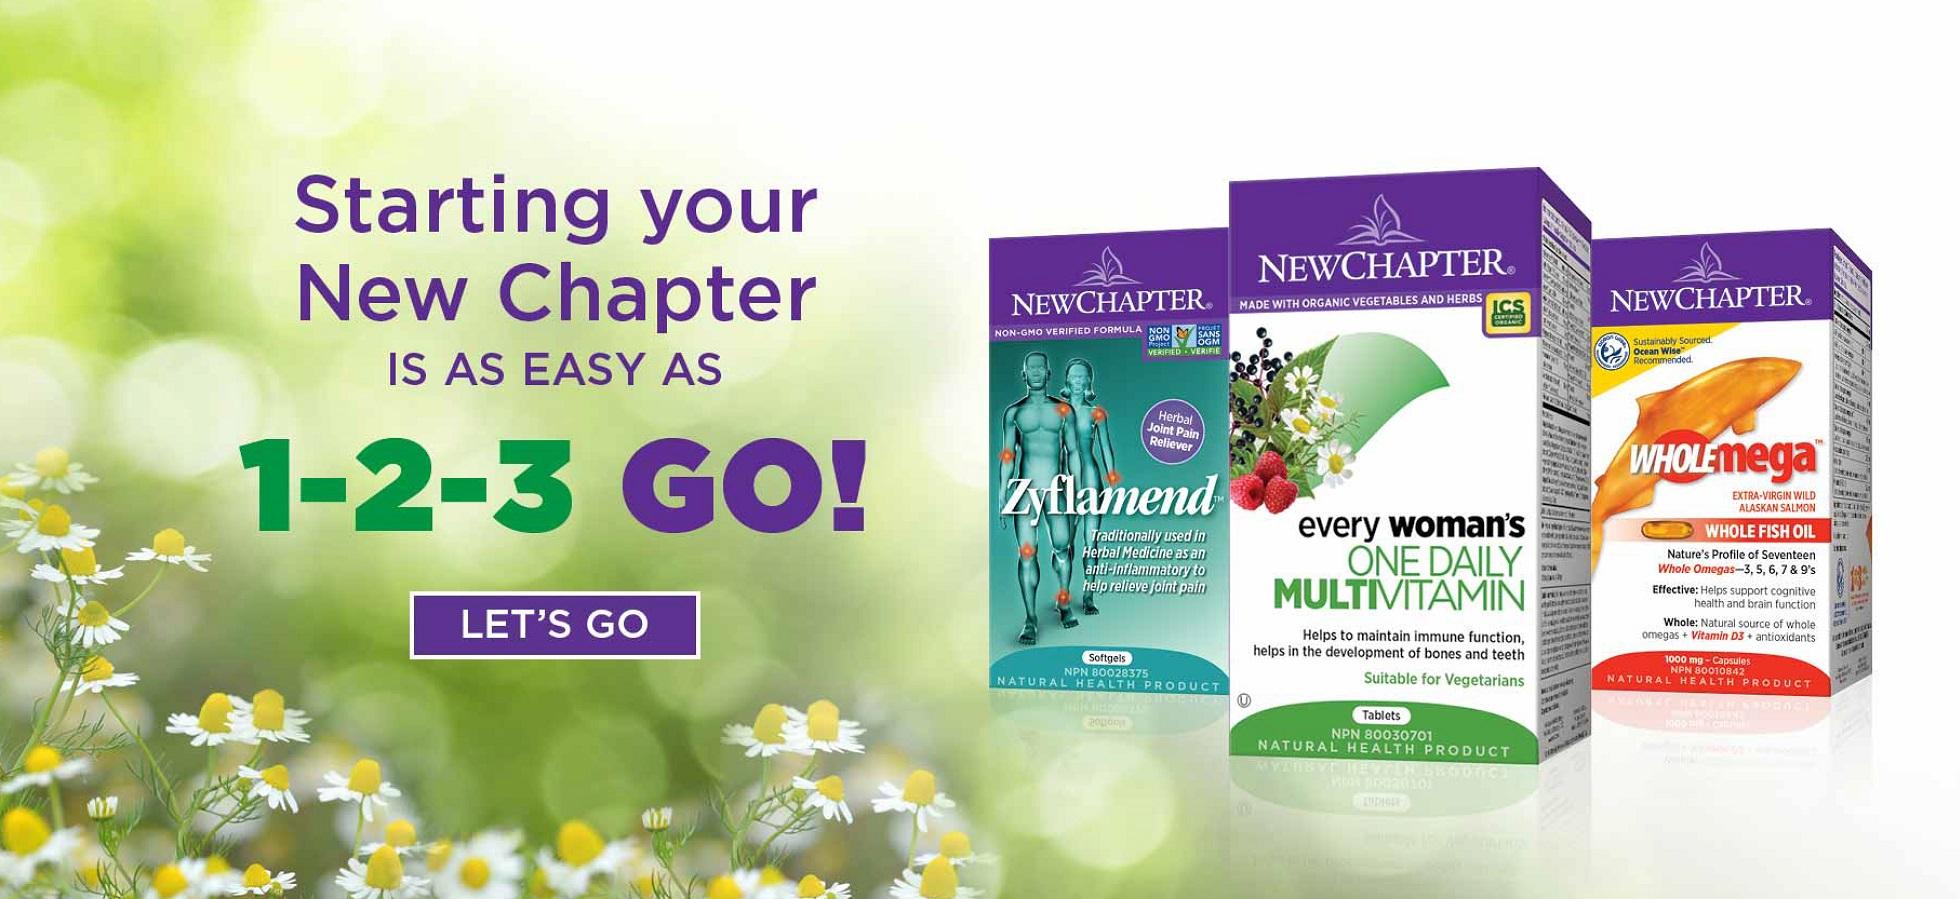 BUY Vitamins and Health Supplements, New Chapter, Culturelle, Webber, Nordic, online at LOTUSmart (HK) Hong Kong